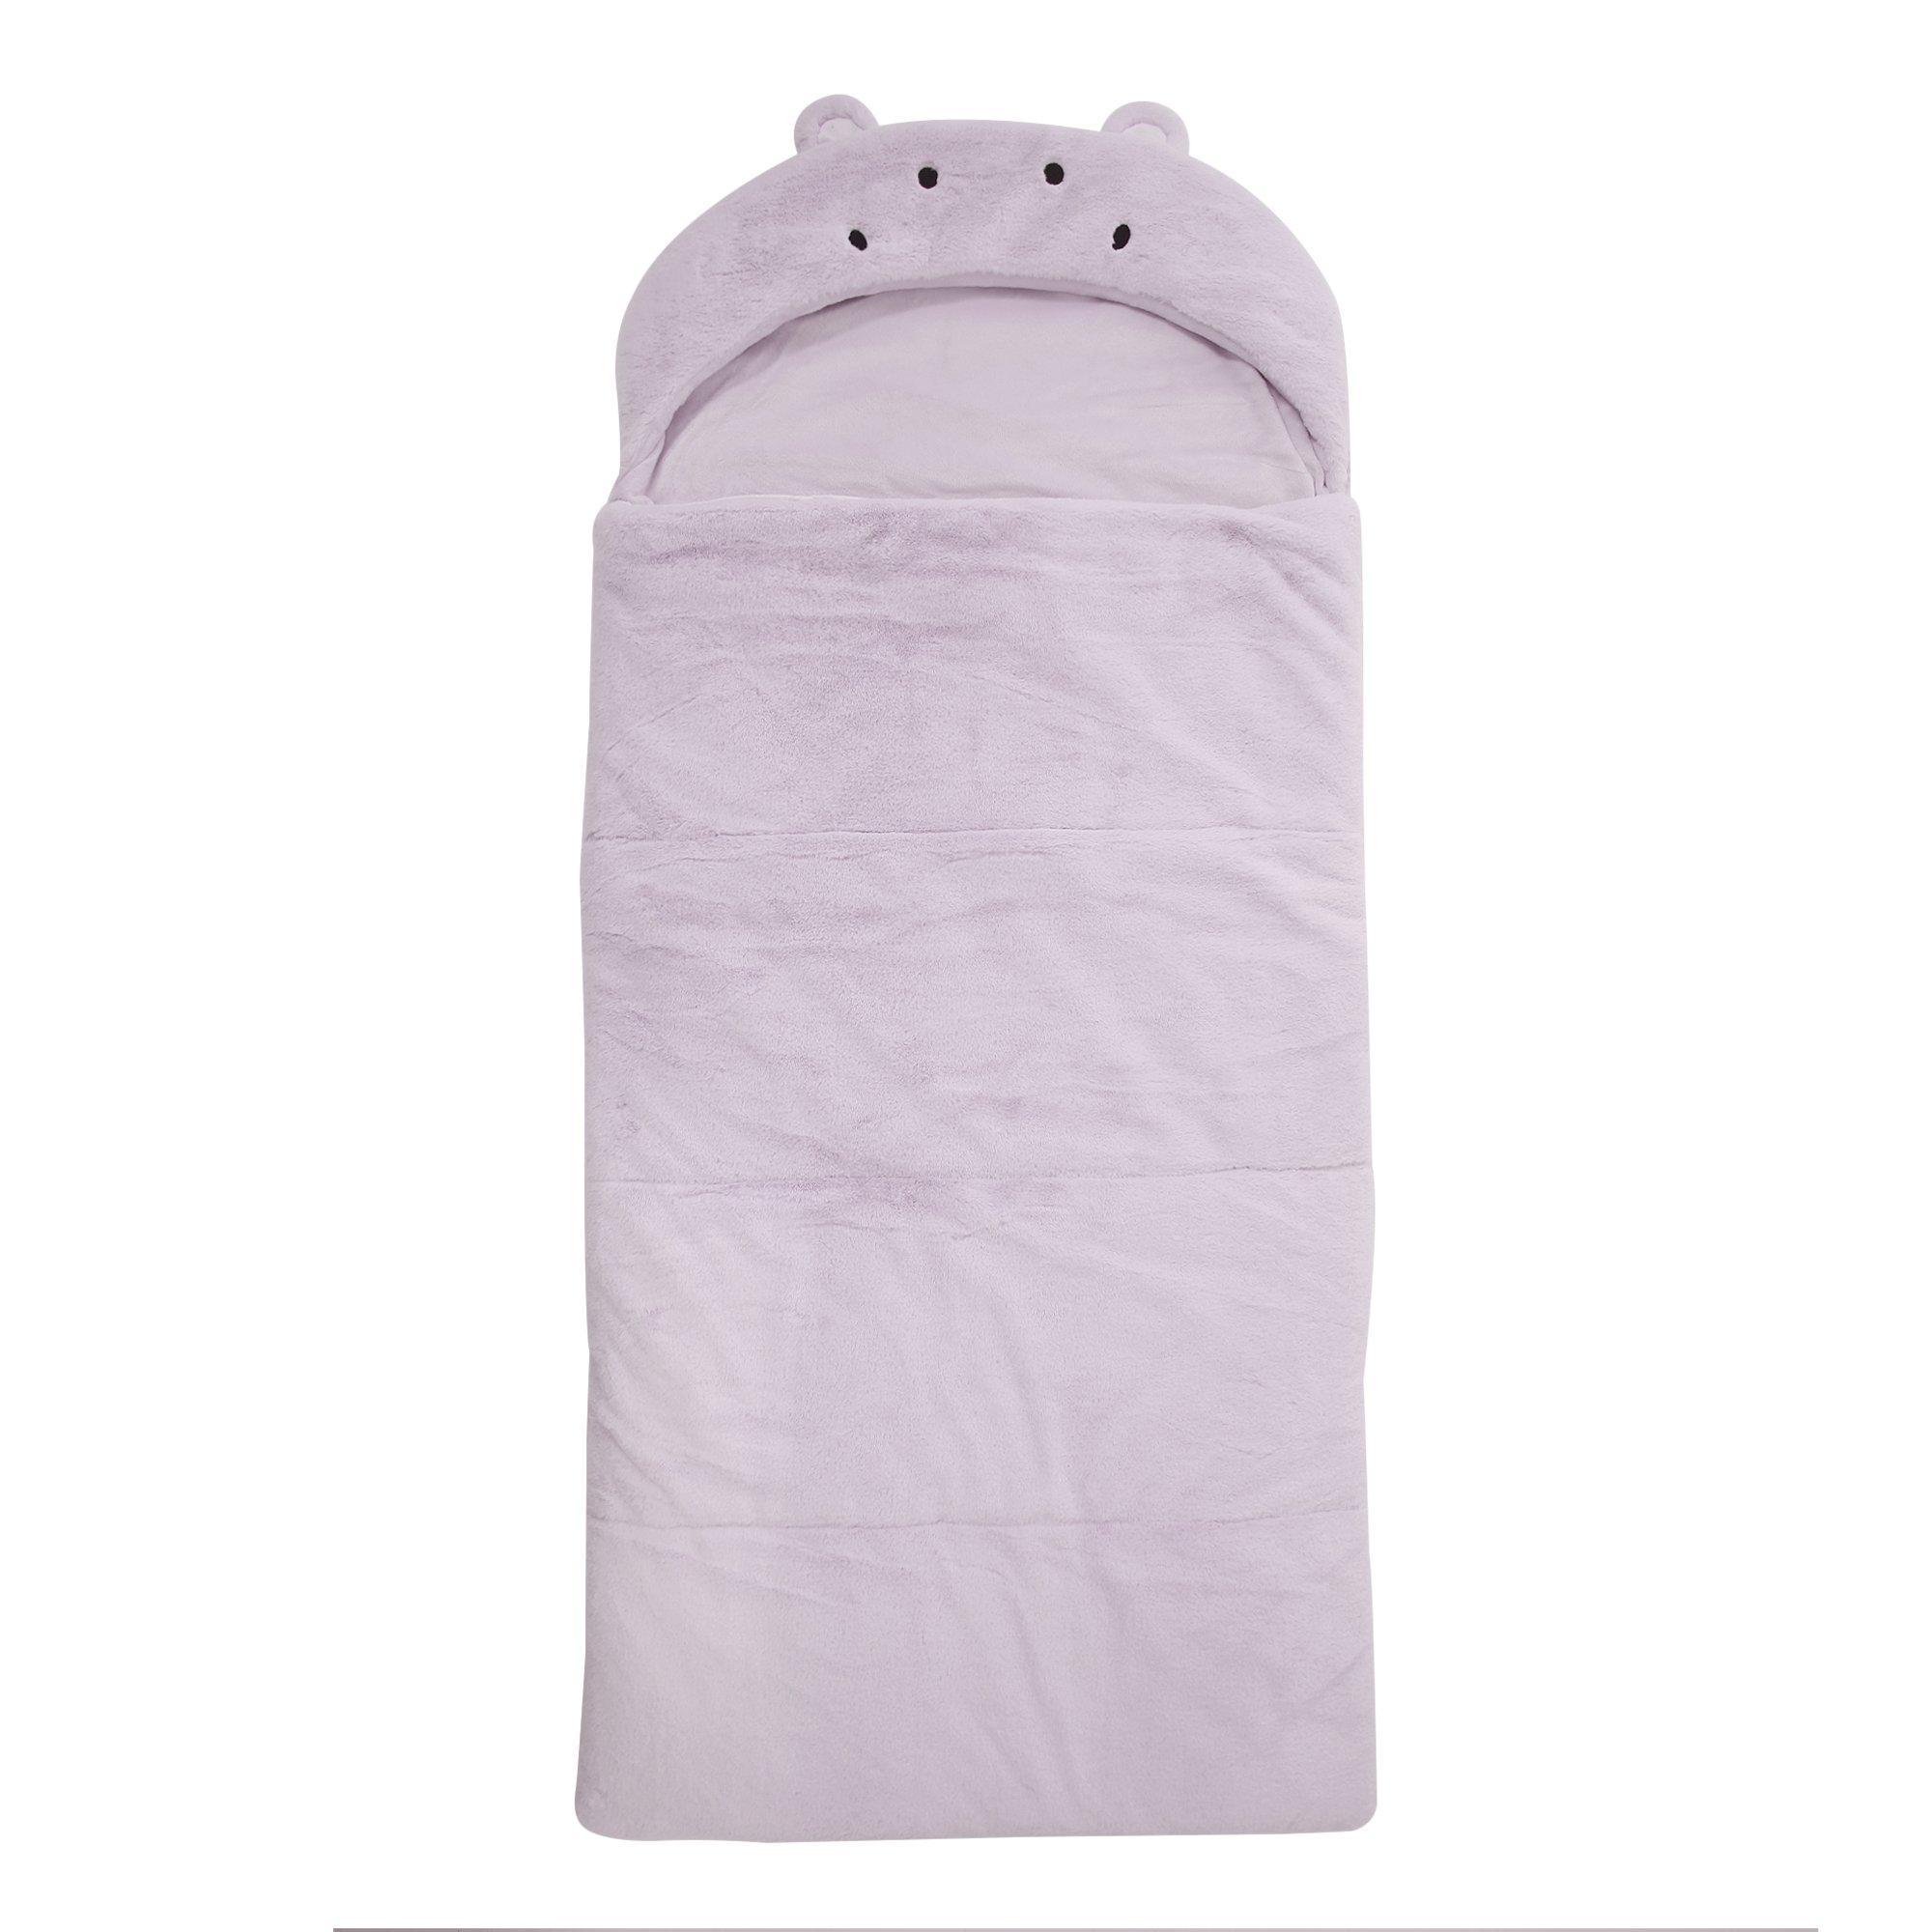 Best Home Fashion Plush Faux Fur Hooded Hippo Animal Sleeping Bag - Lavender - 27'' W x 59'' L - (1 Sleeping Bag)